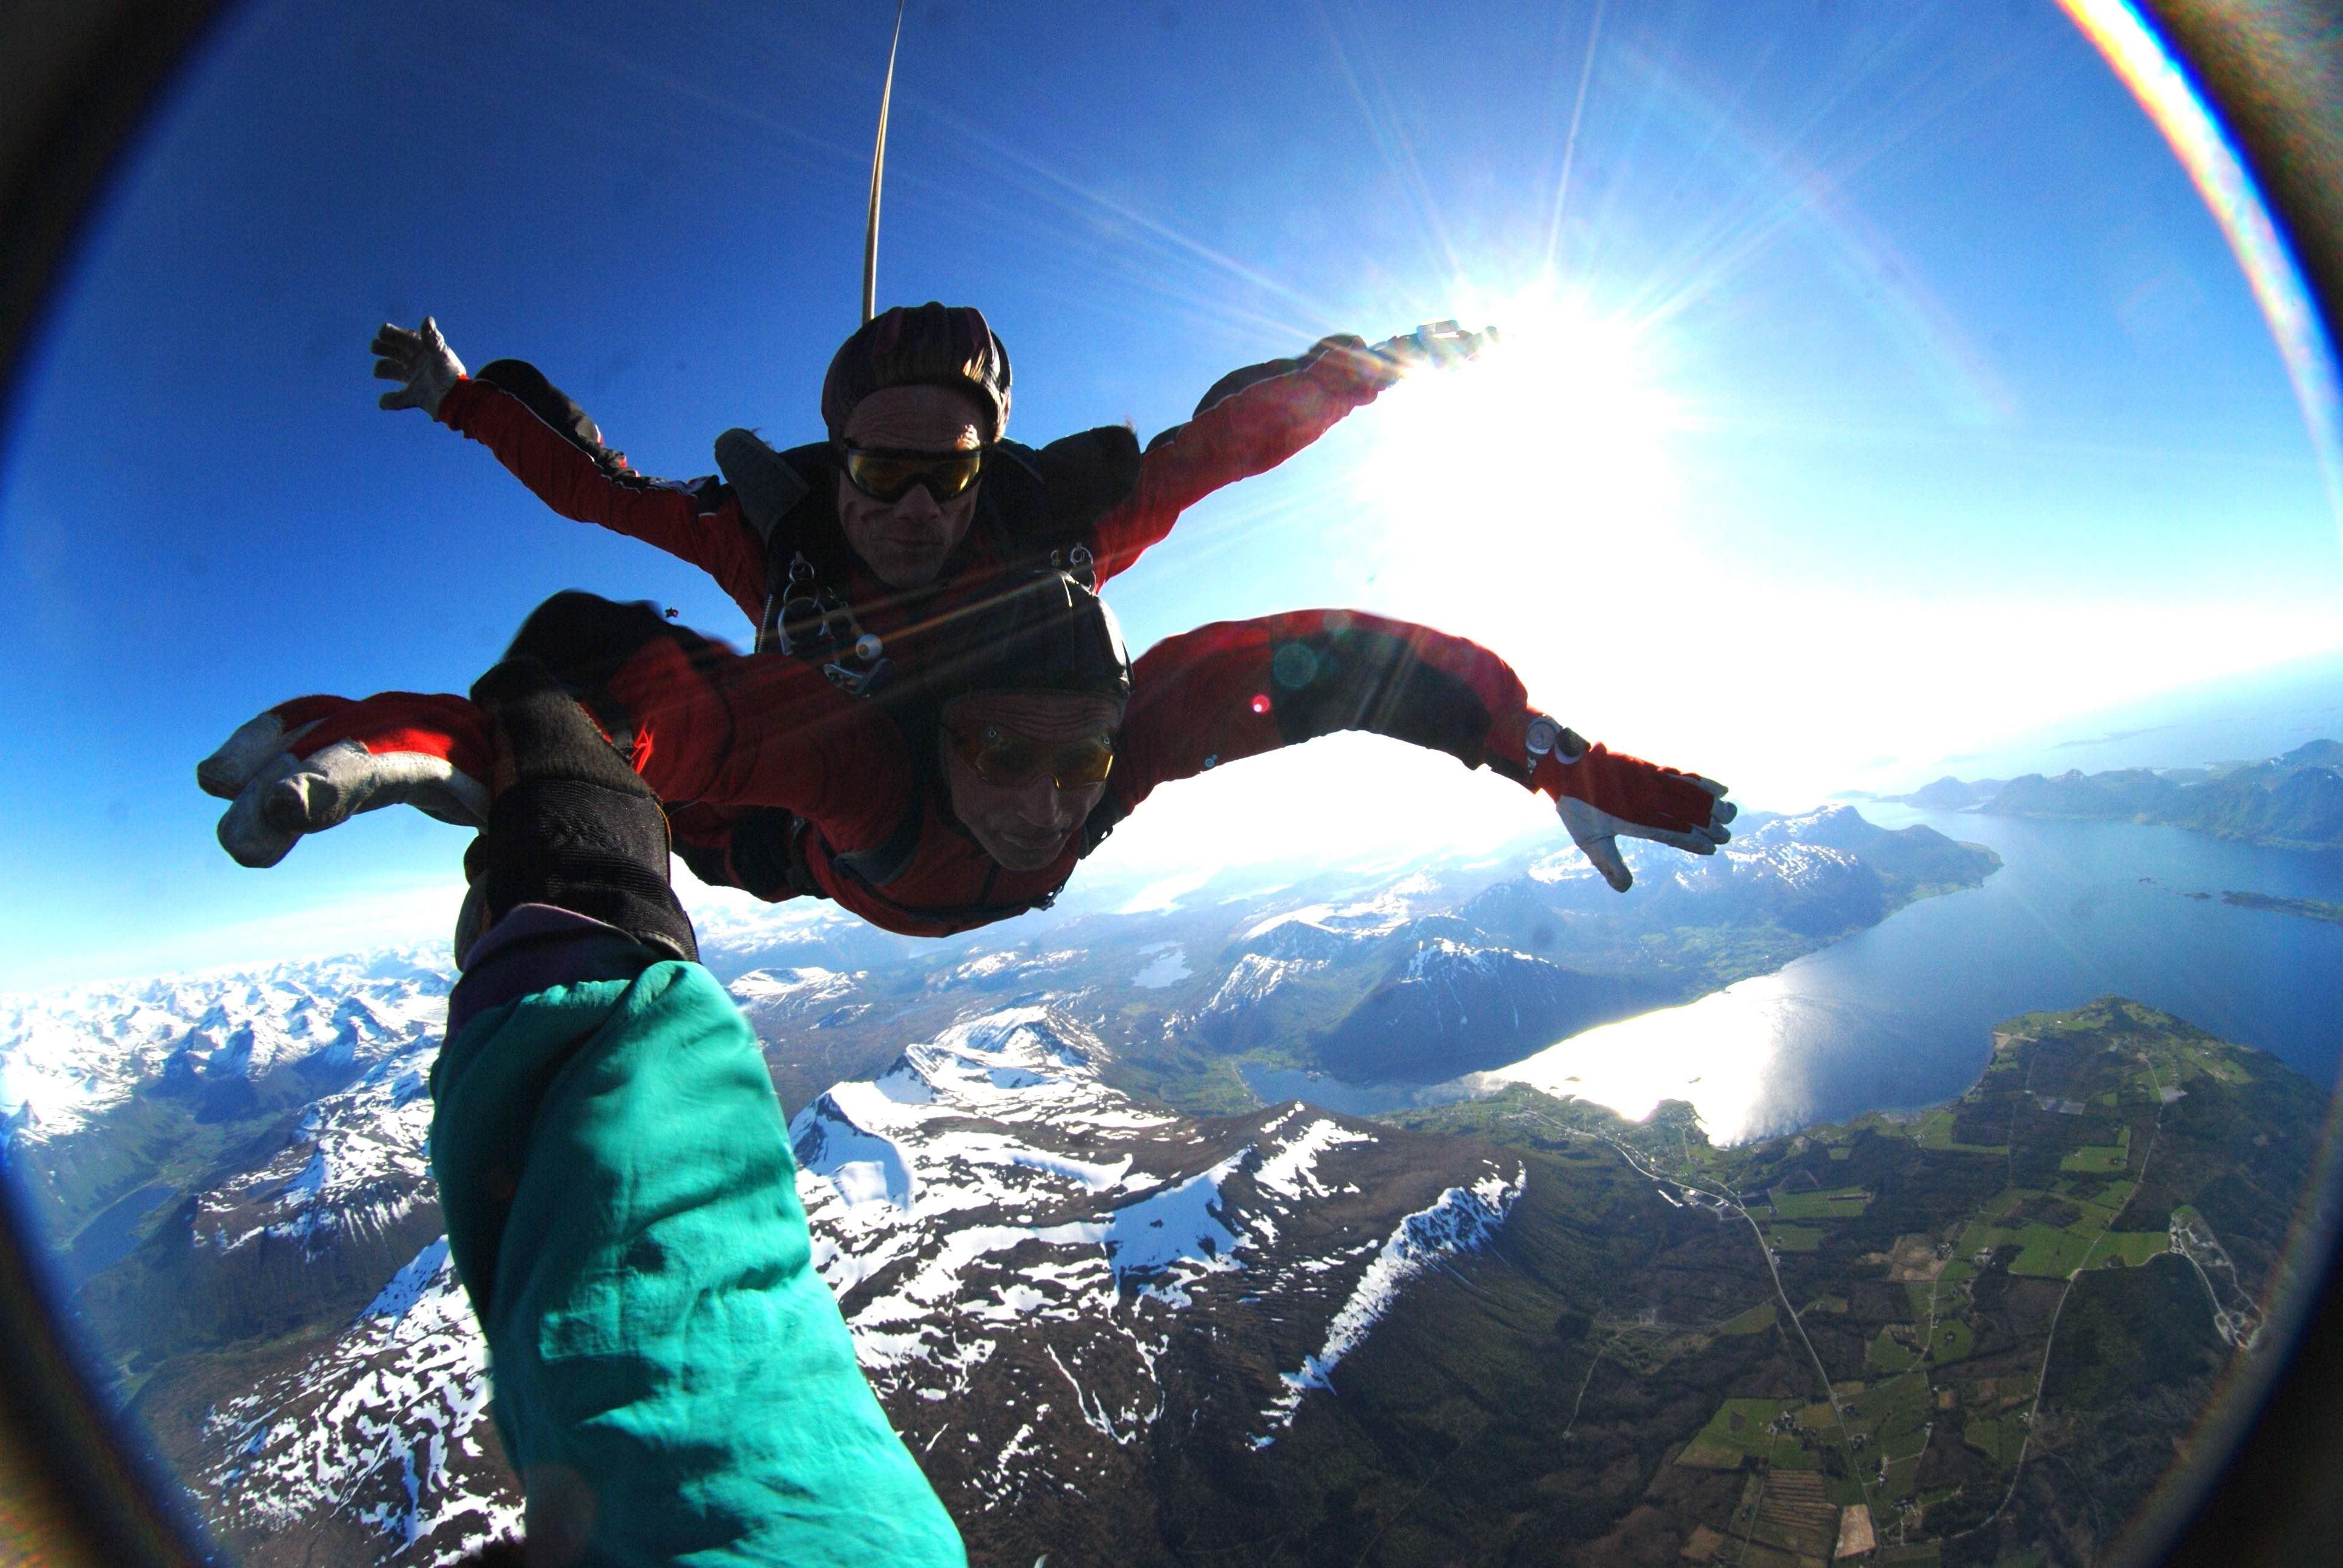 Lesja Parachute Club